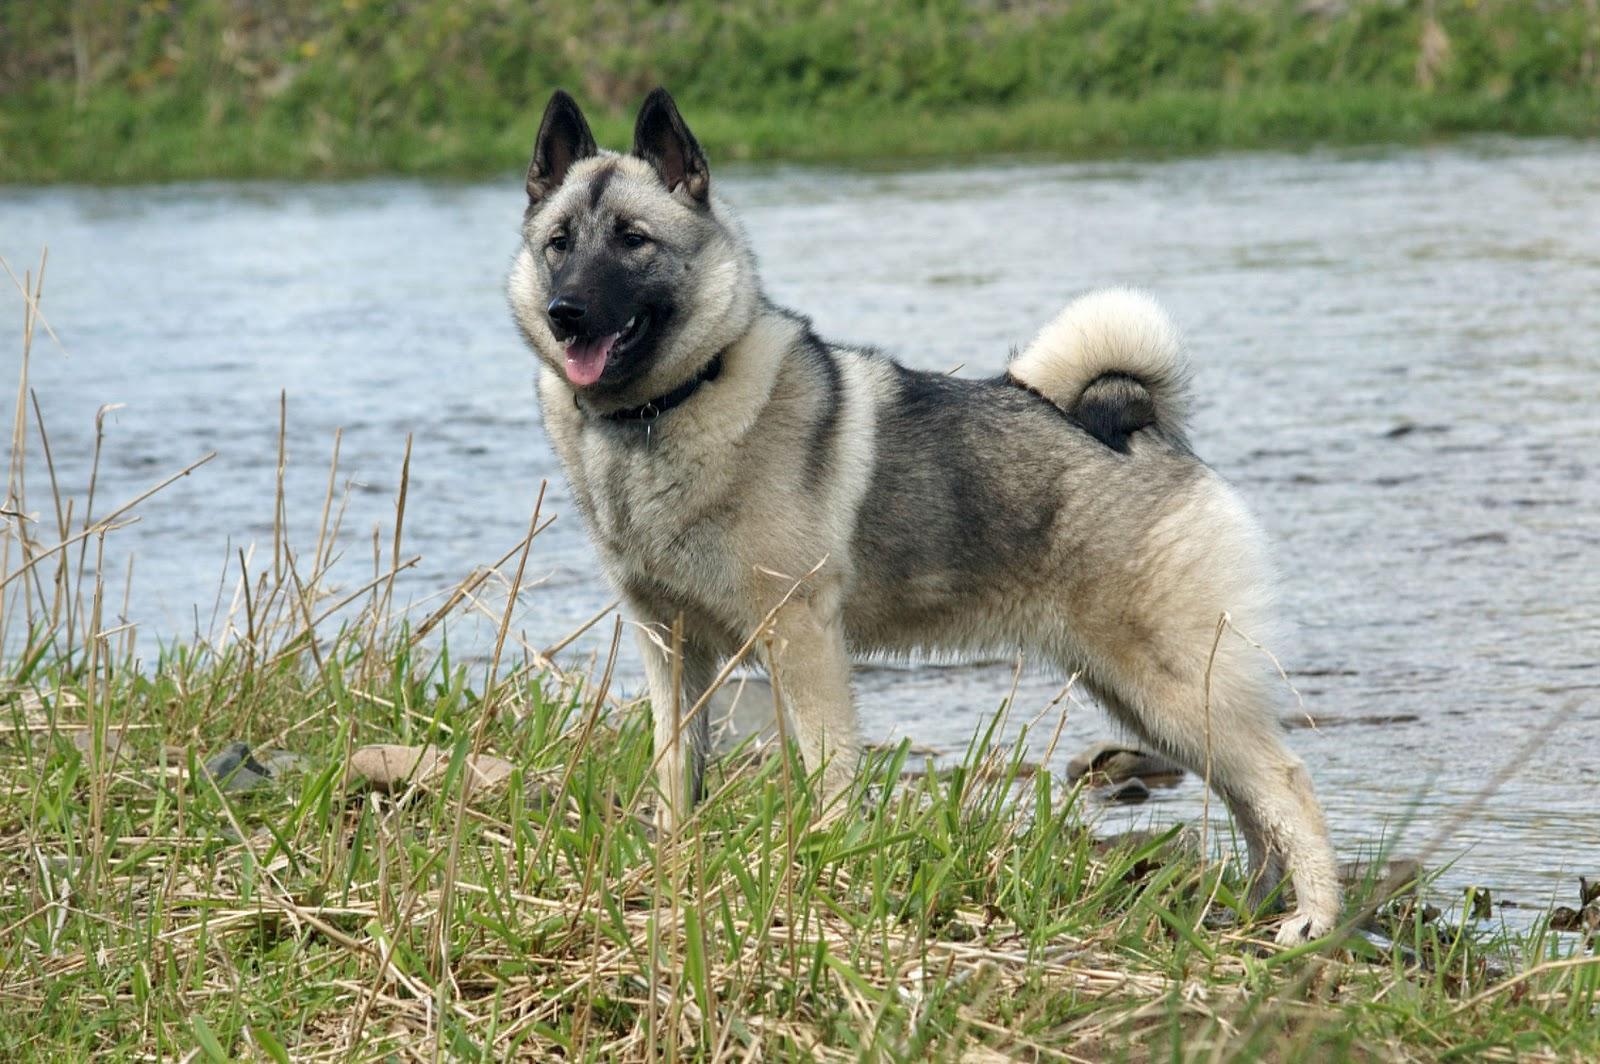 Long-haired Norwegian Elkhound dog on the river, Gourgeous Norwegian Elkhound dog